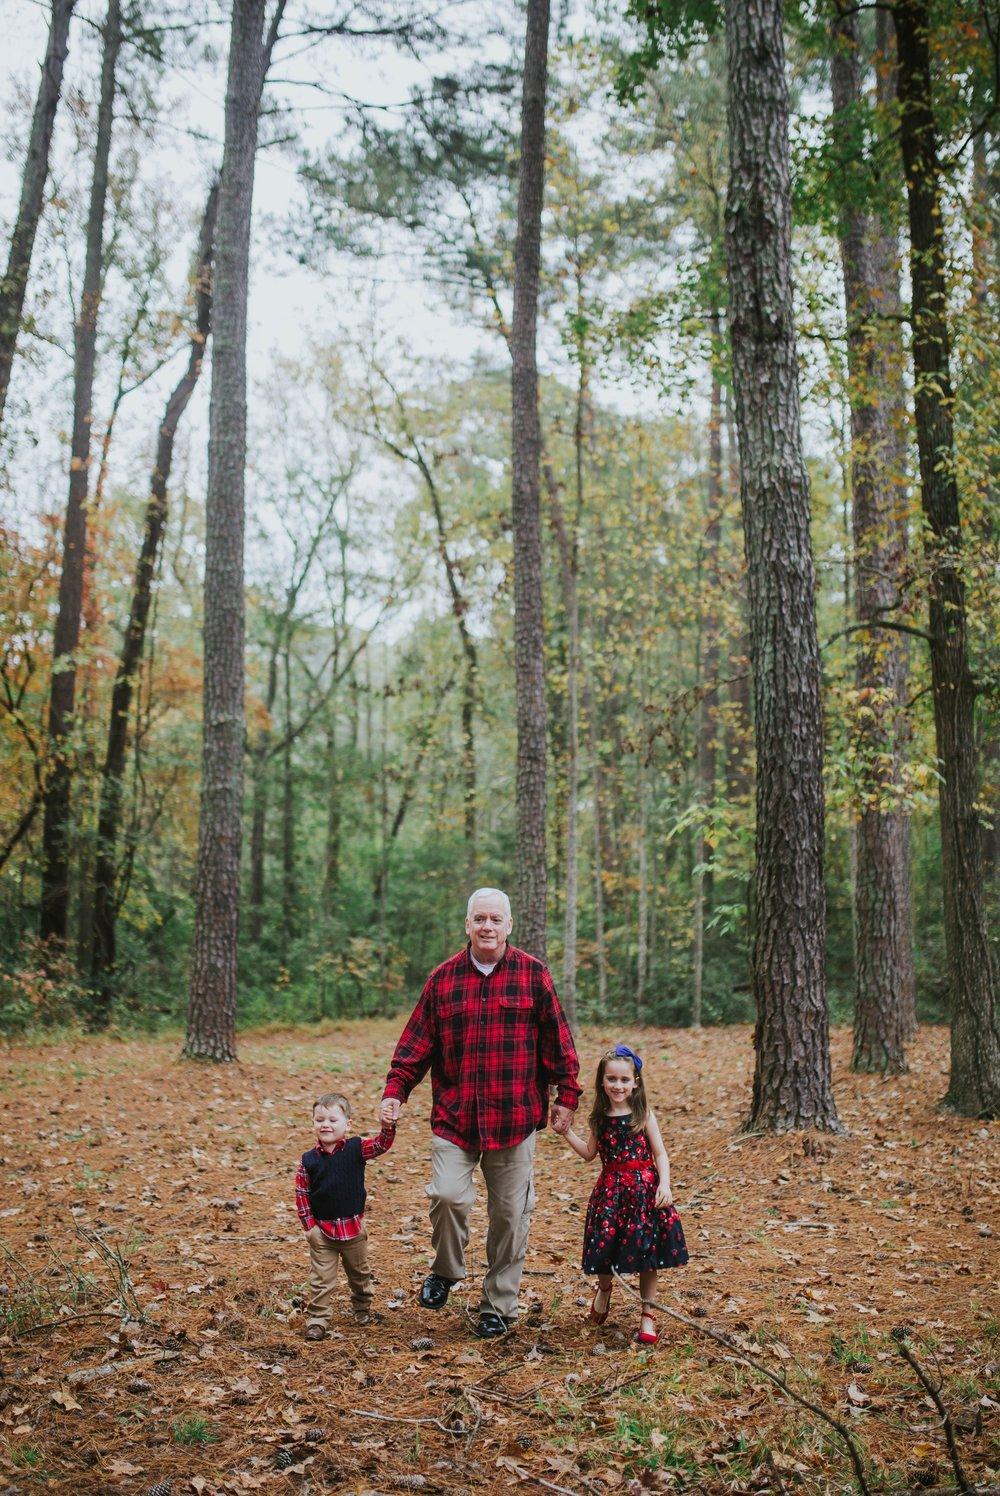 Ryan's - Family Photographer at Clark Park in Fayetteville, North Carolina